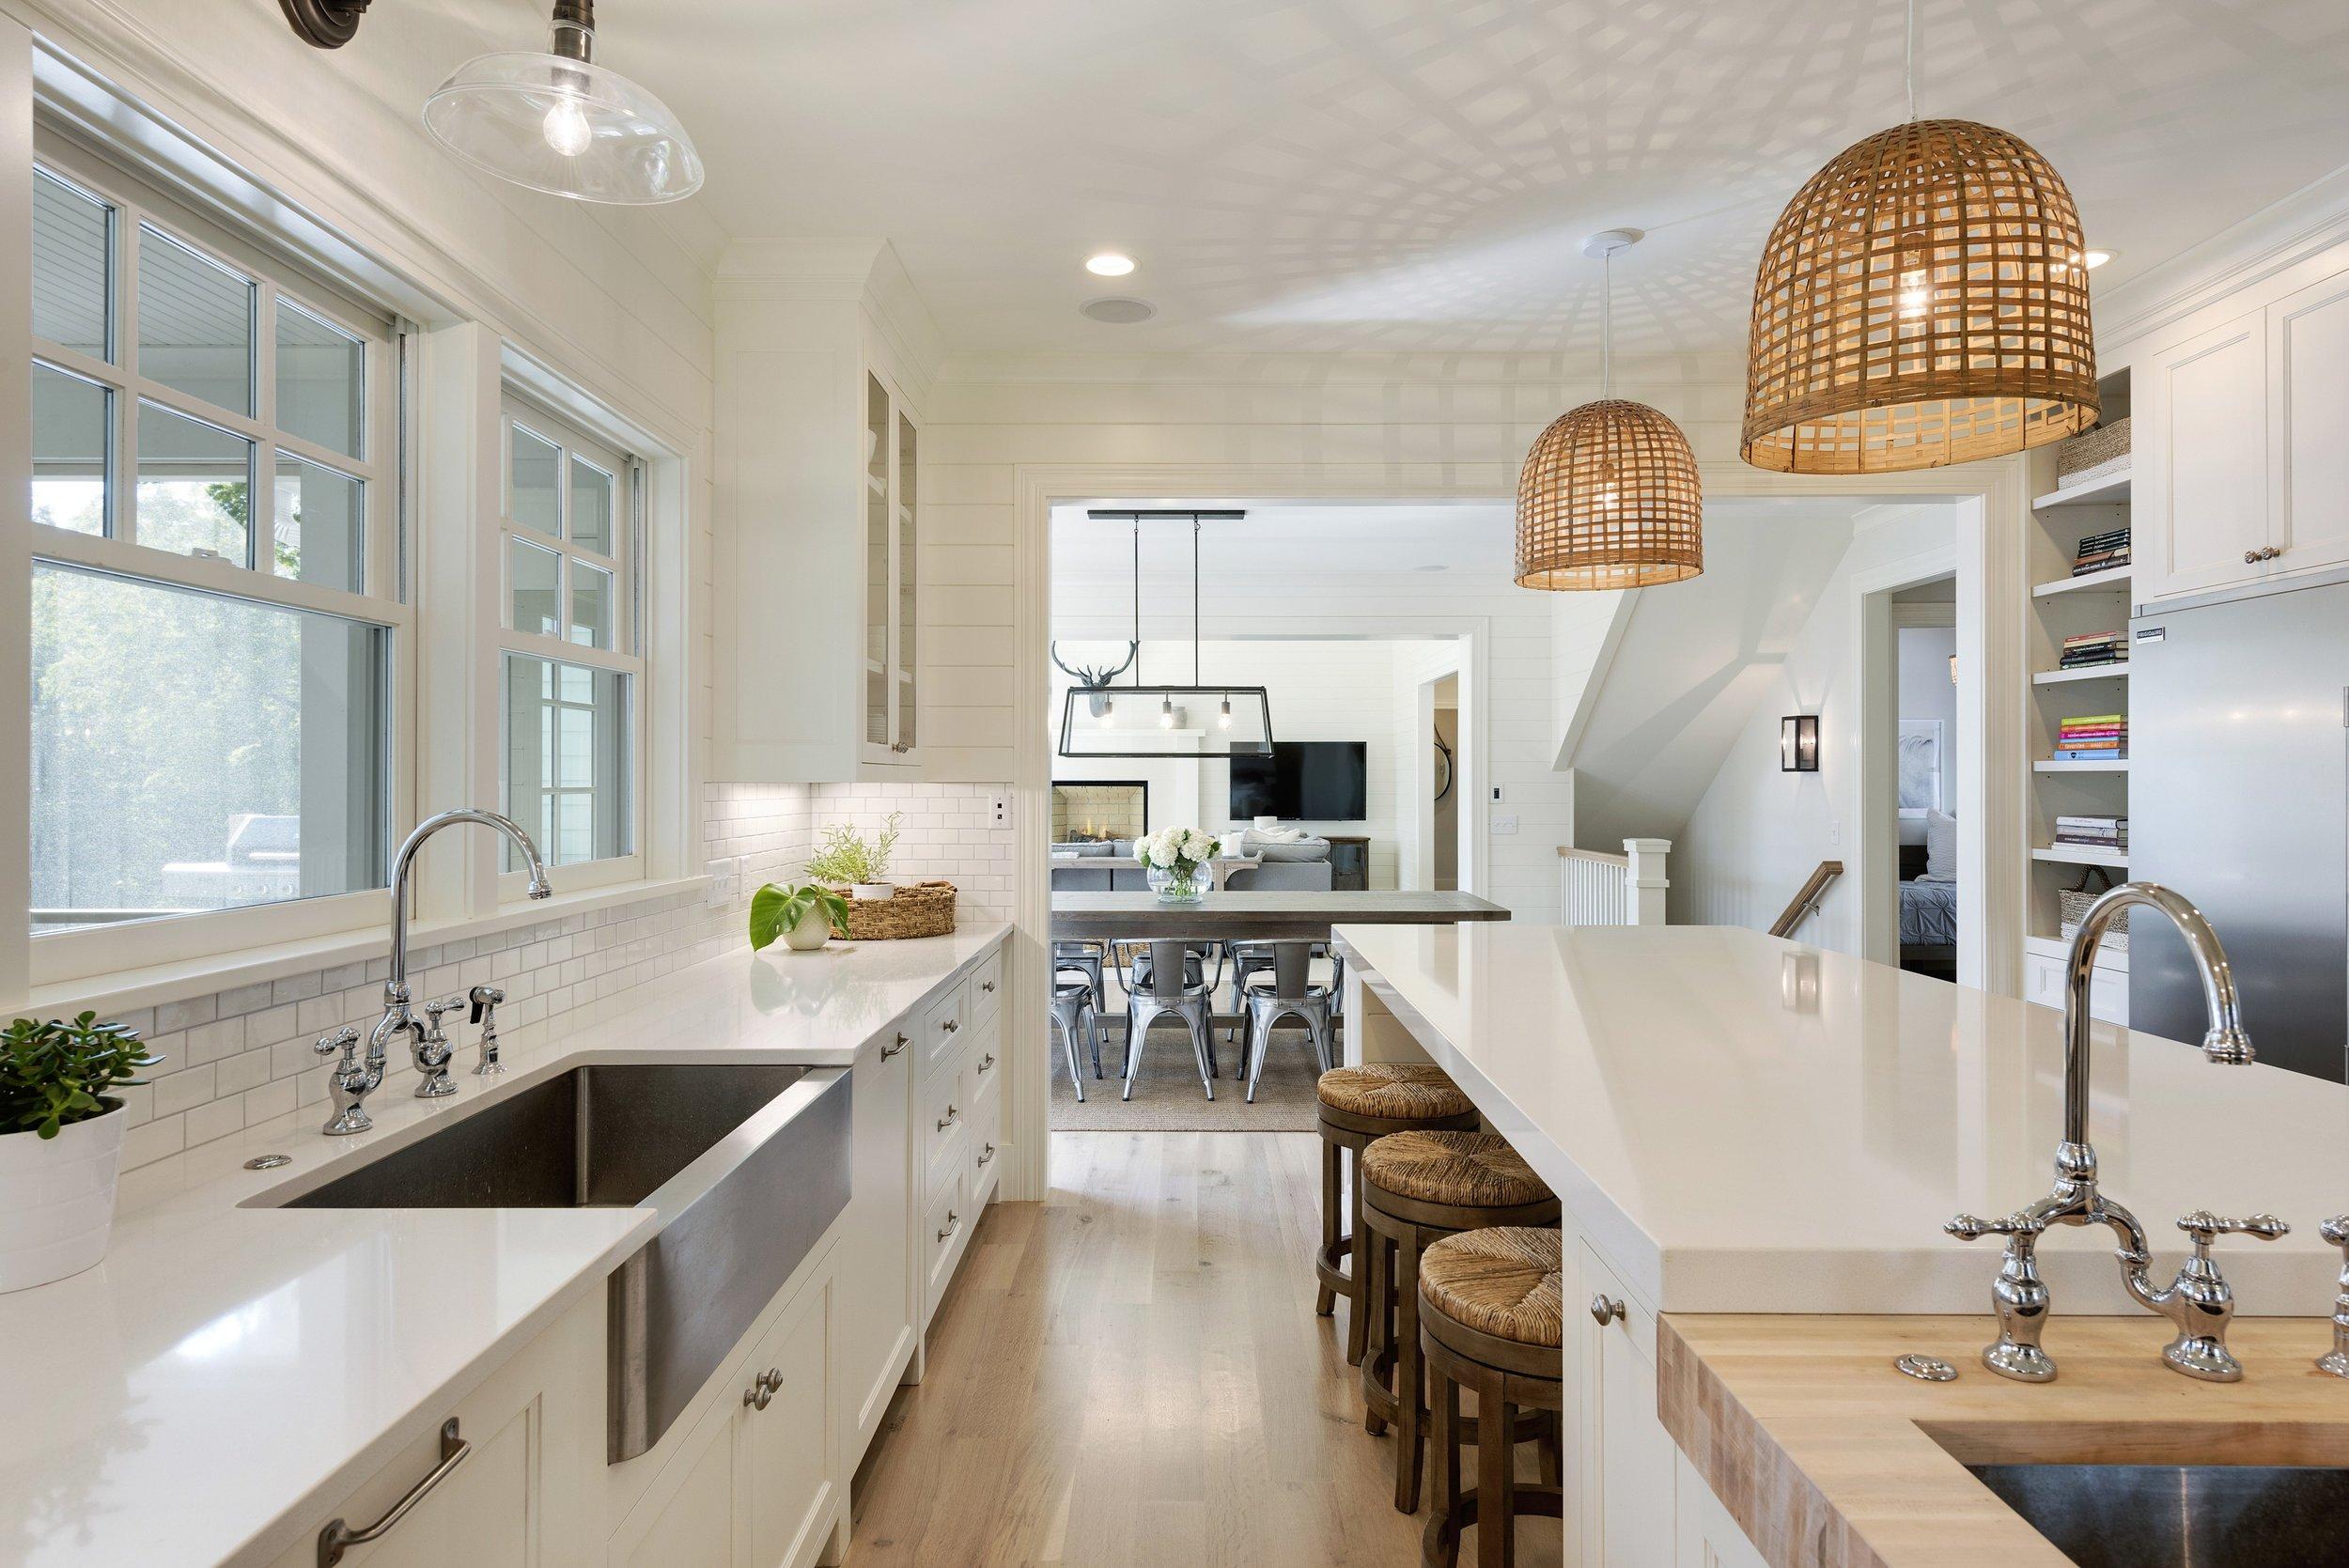 9-birchwood-kitchen:dining.jpg